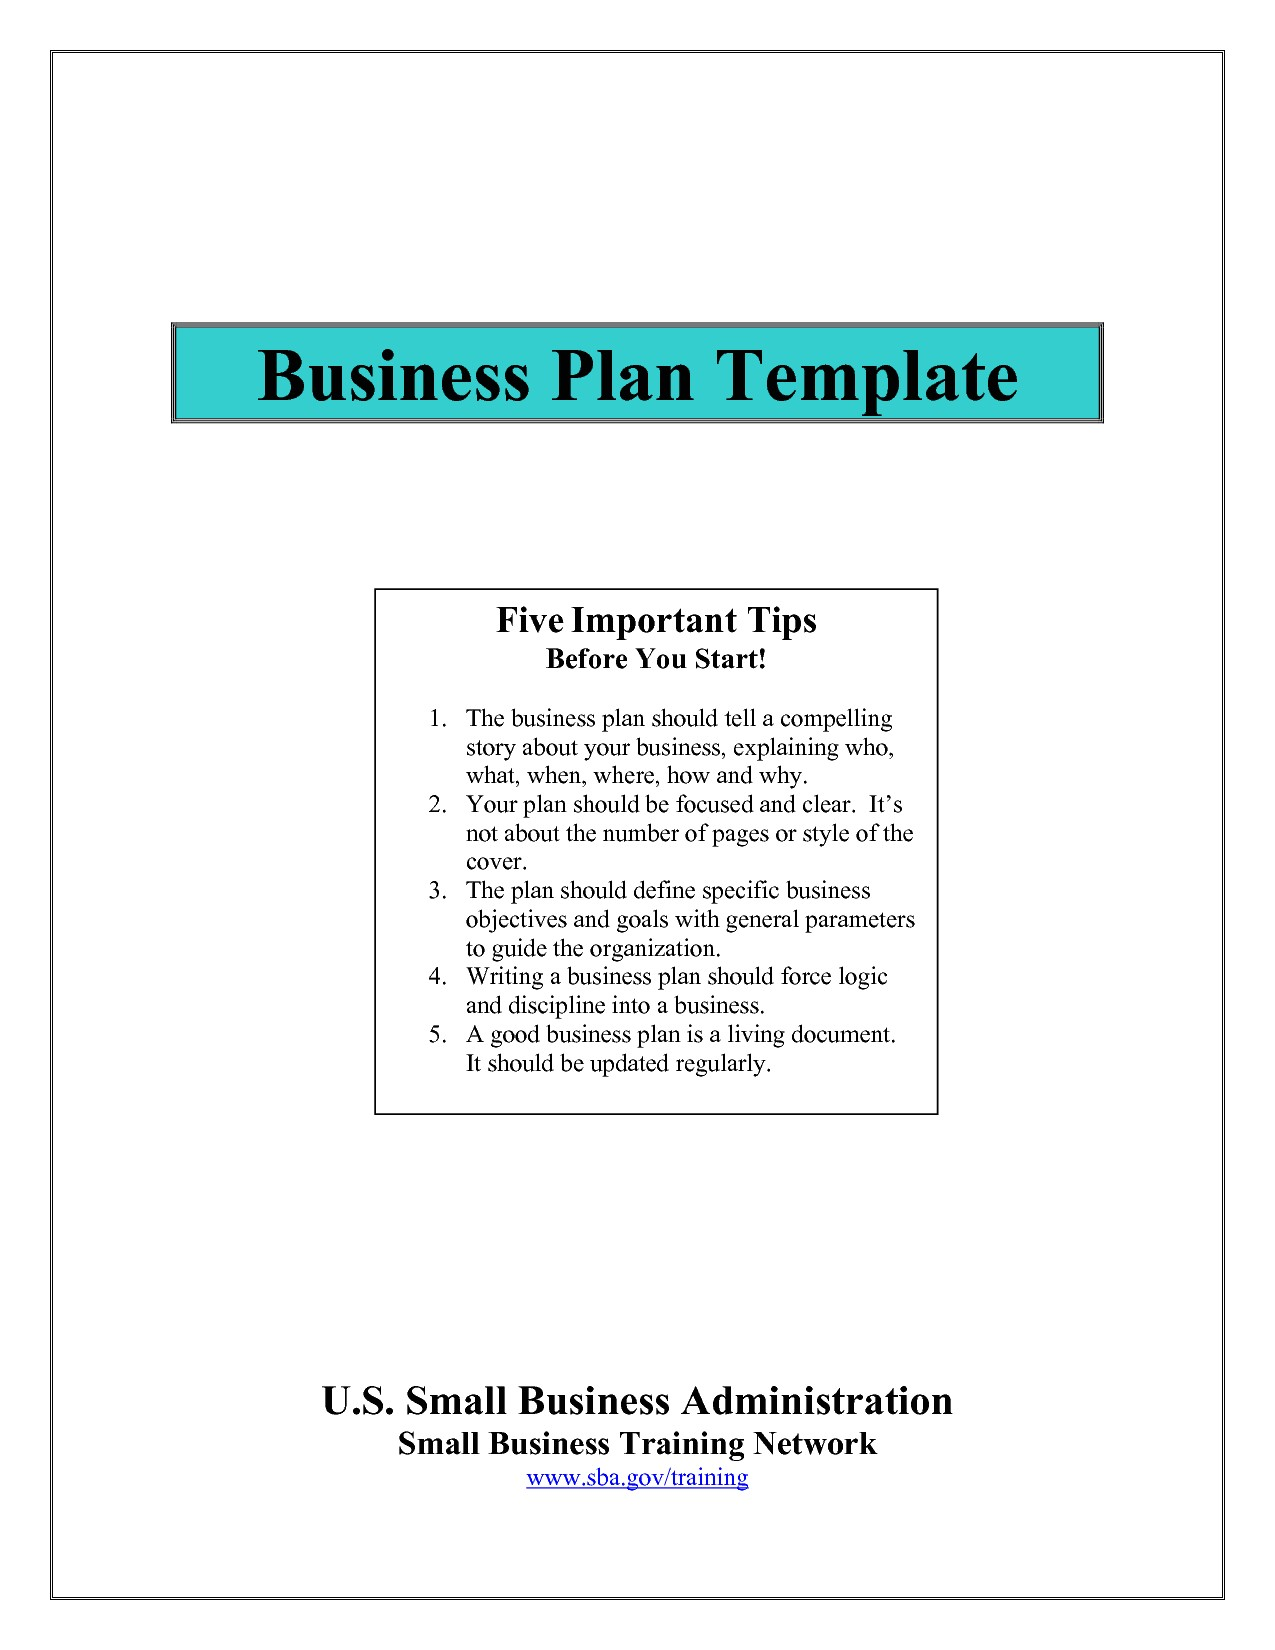 Sba Business Plan Template Pdf Sba Business Plan Template E Commerce